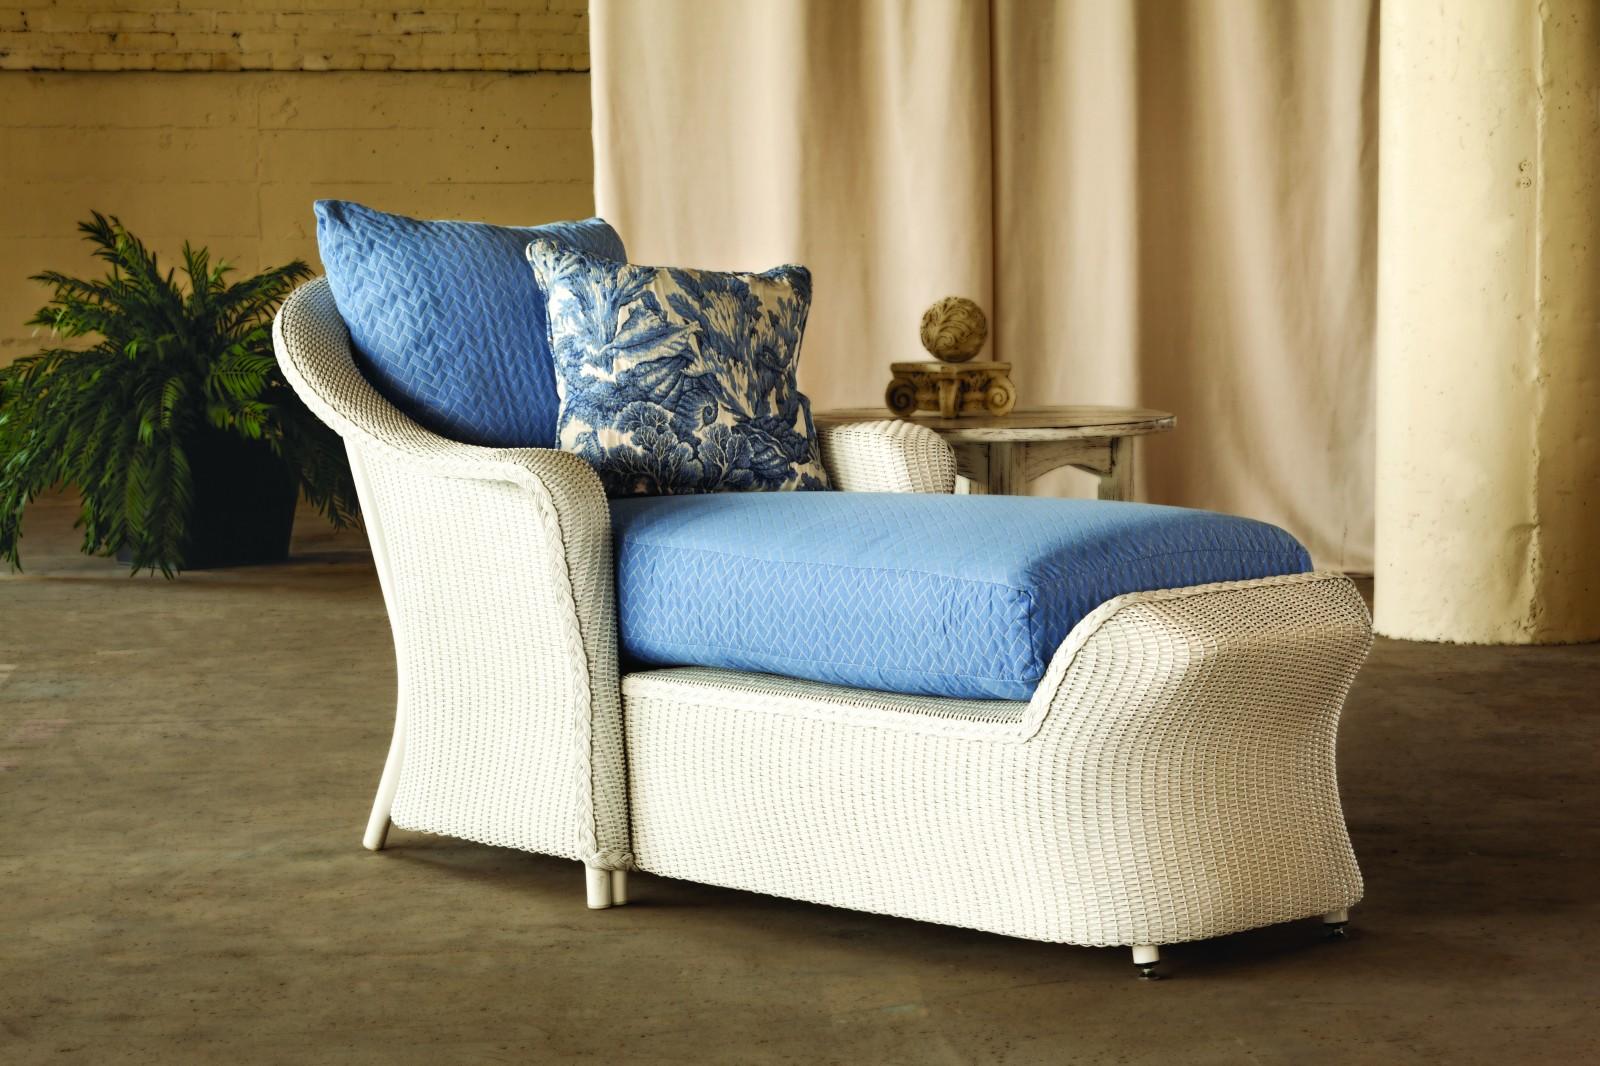 ... Lloyd Flanders, Patio U0026 Casual. Perfect Relaxation ...